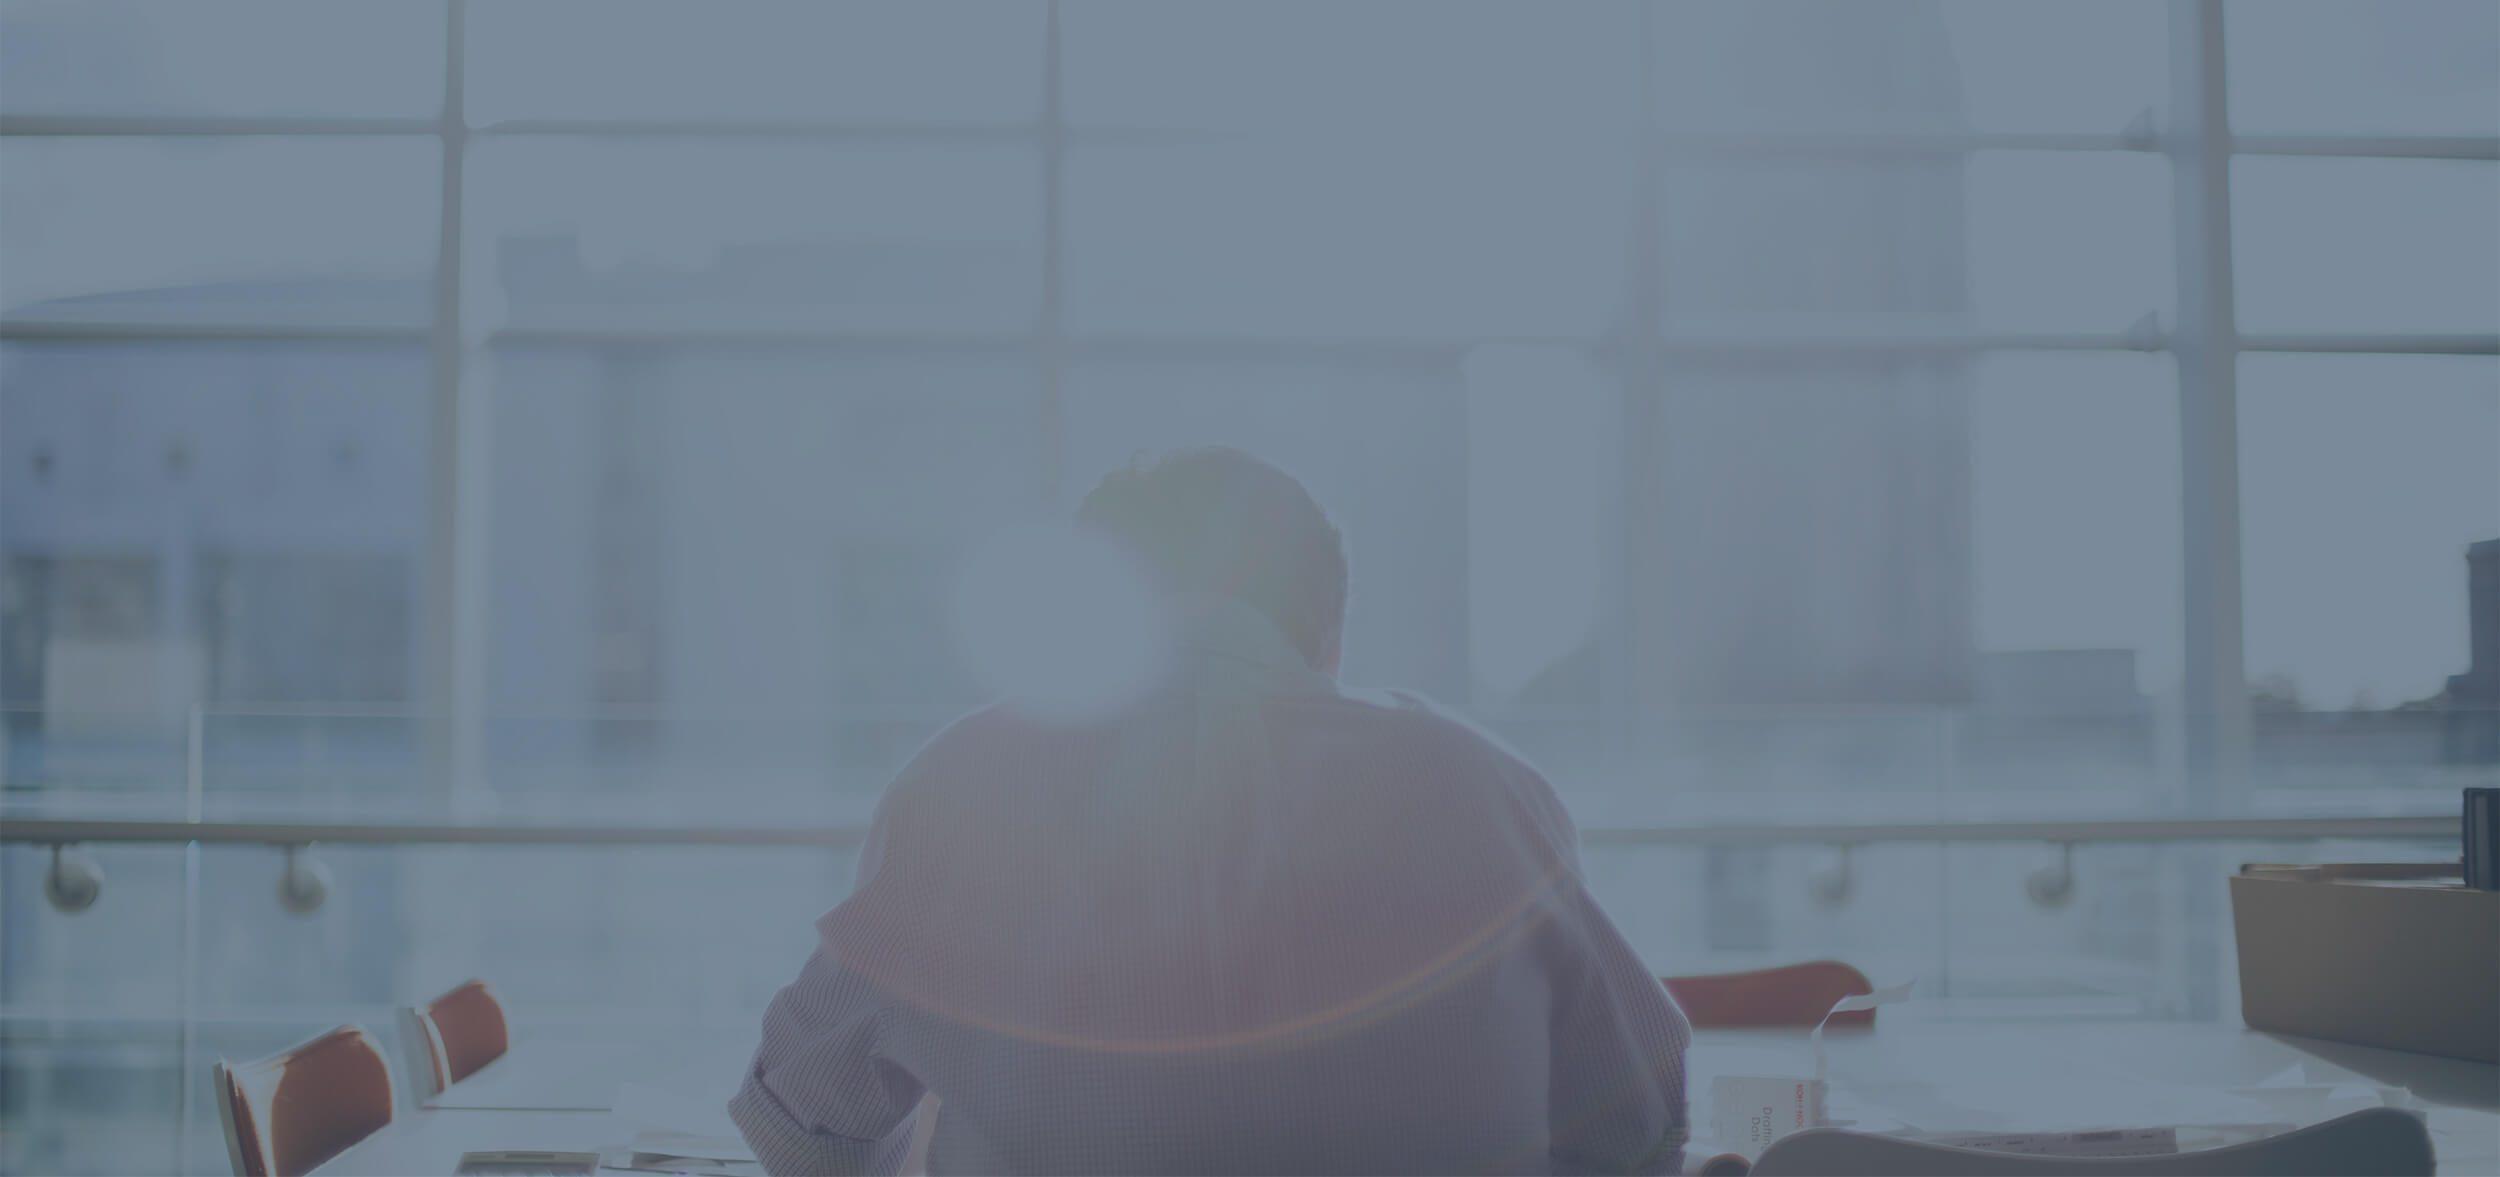 How To Improve Employee Retention - itris